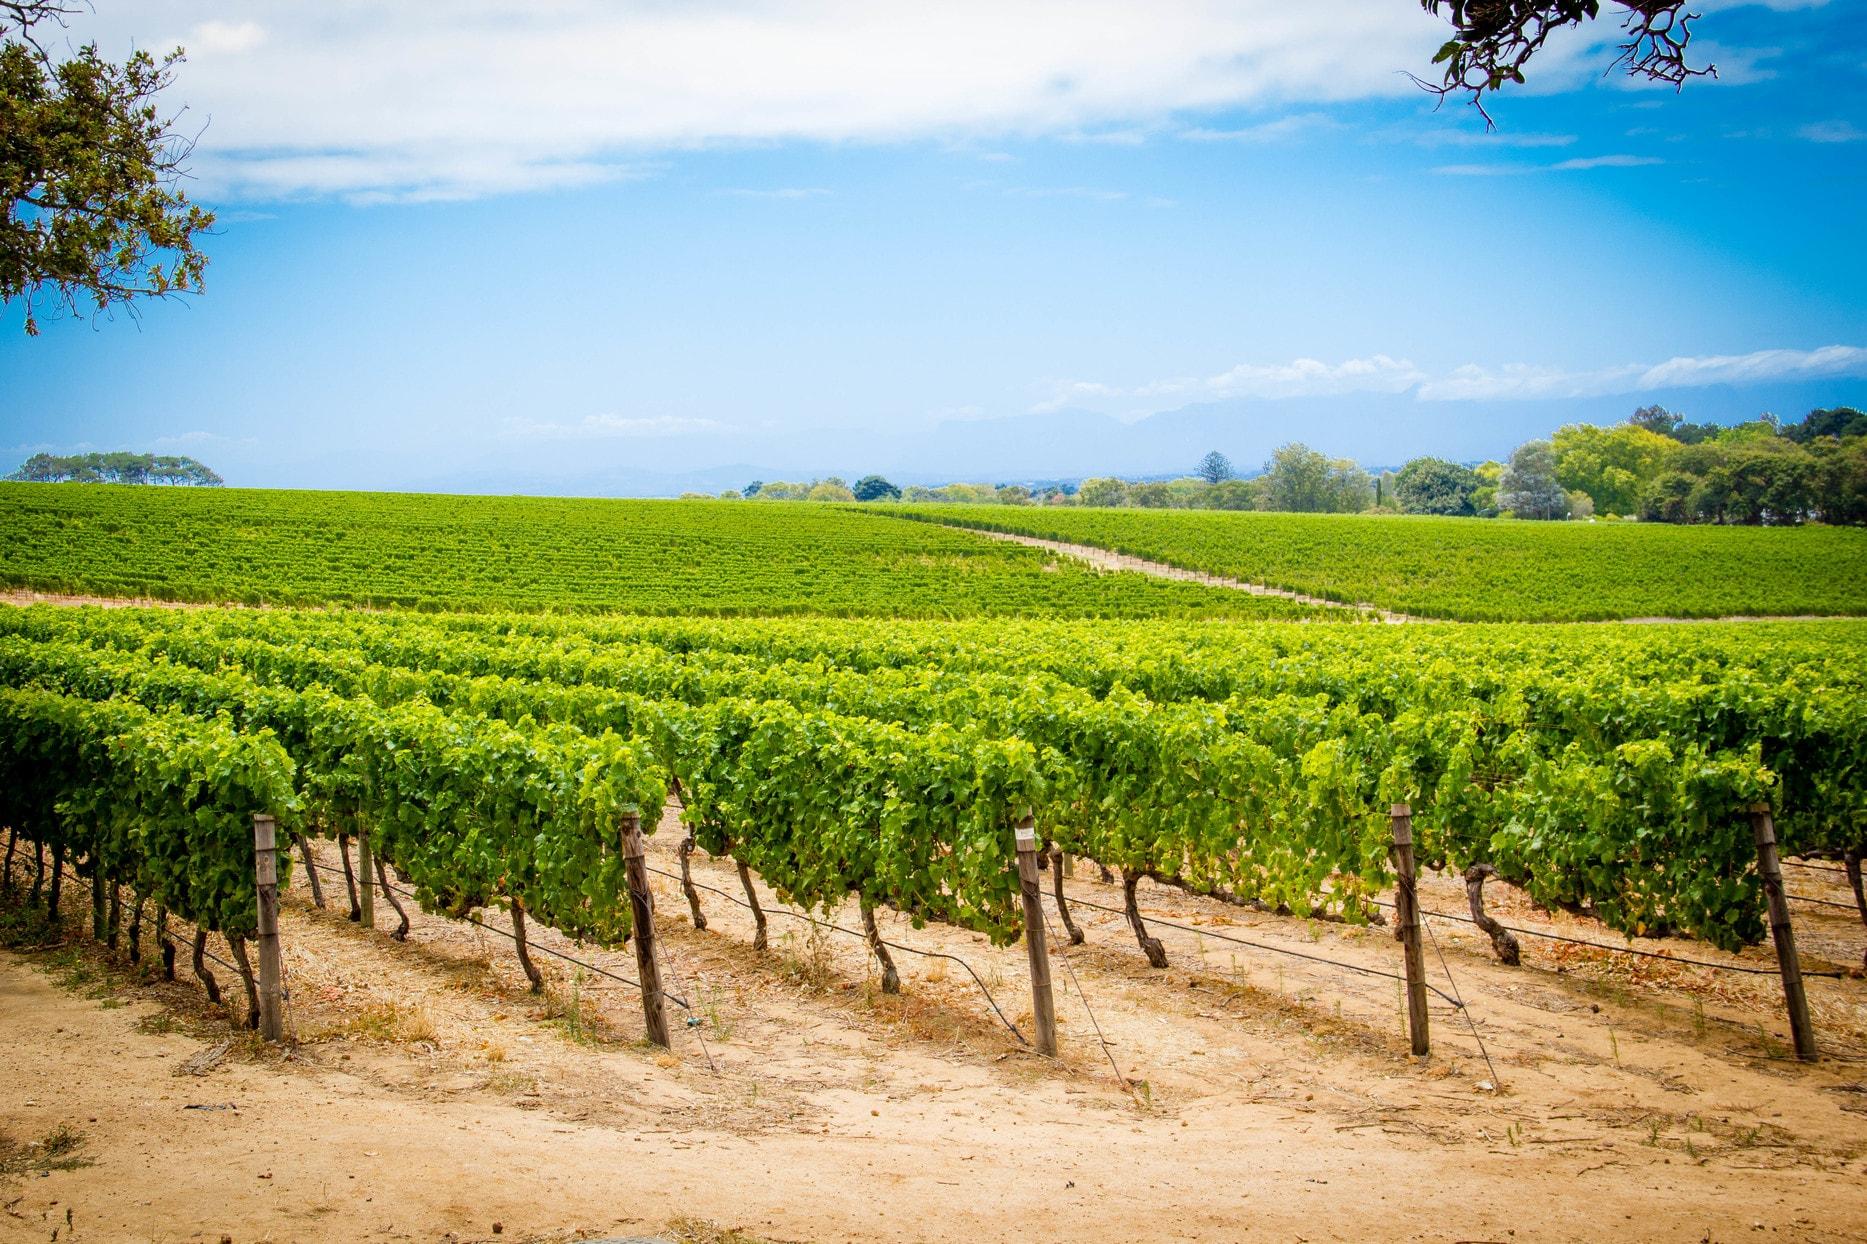 The beautiful green vineyards at Groot Constantia-min.jpg